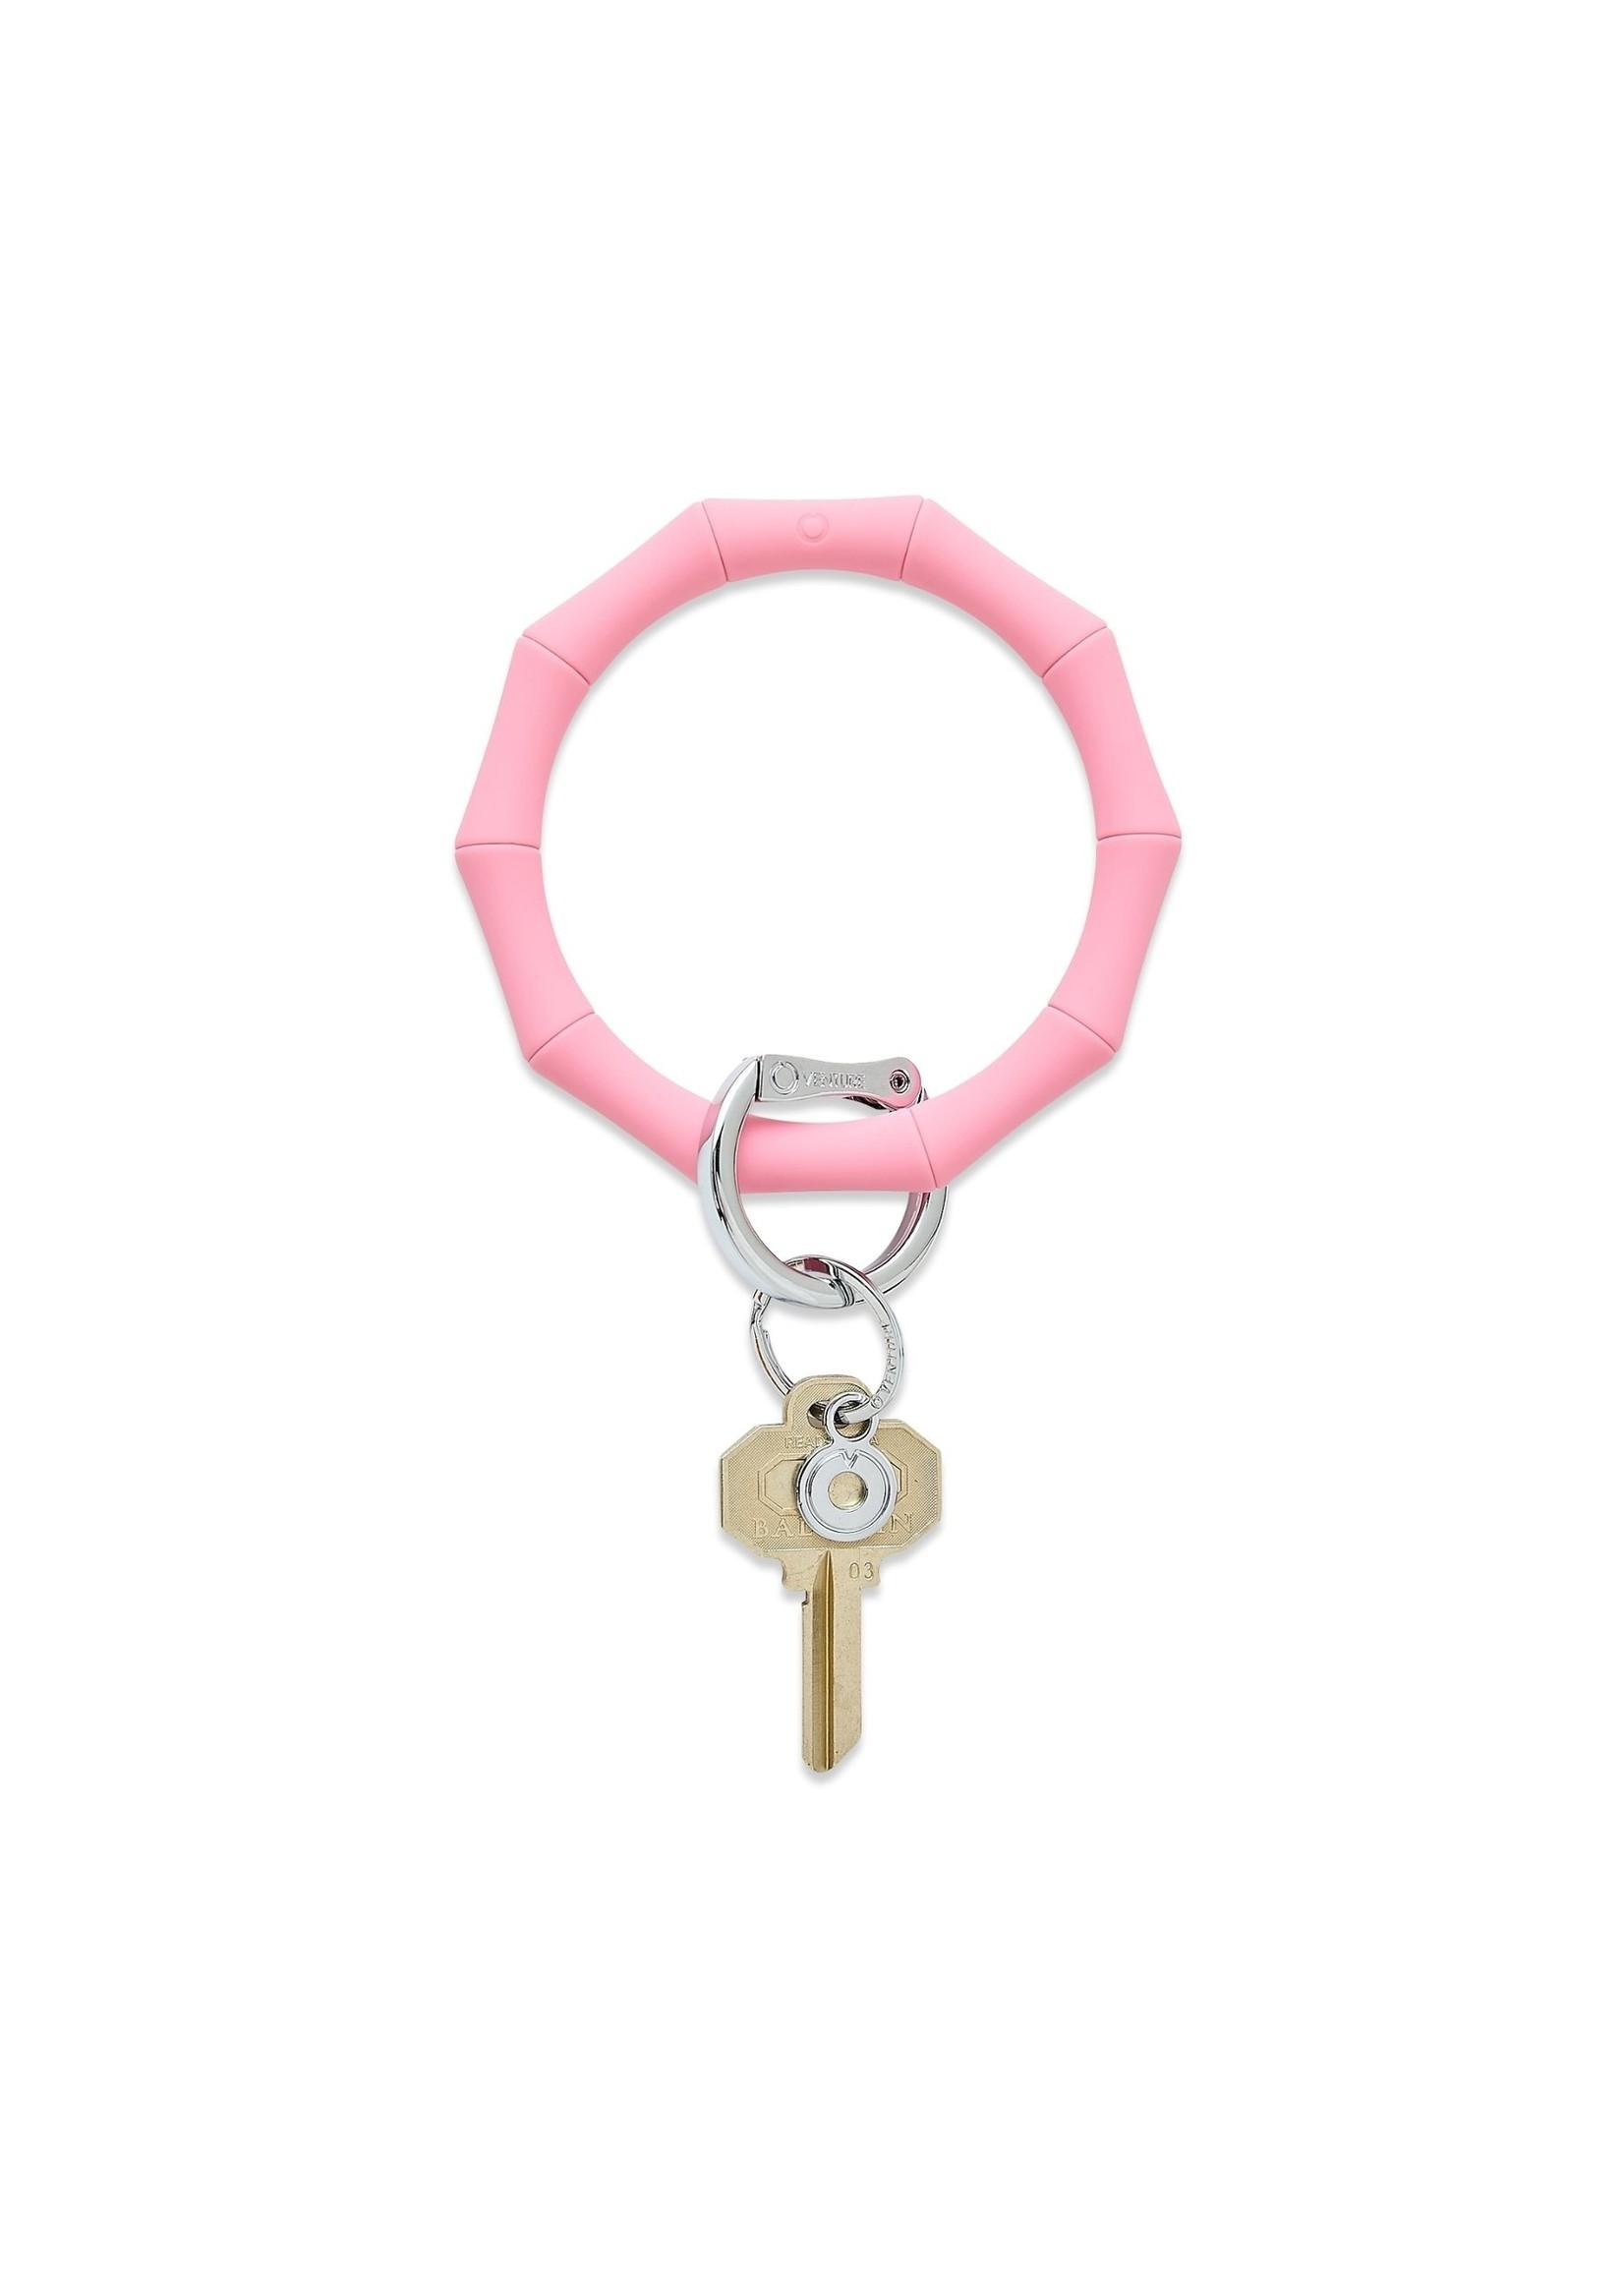 O-venture Silicone Key Ring - Pink Bamboo